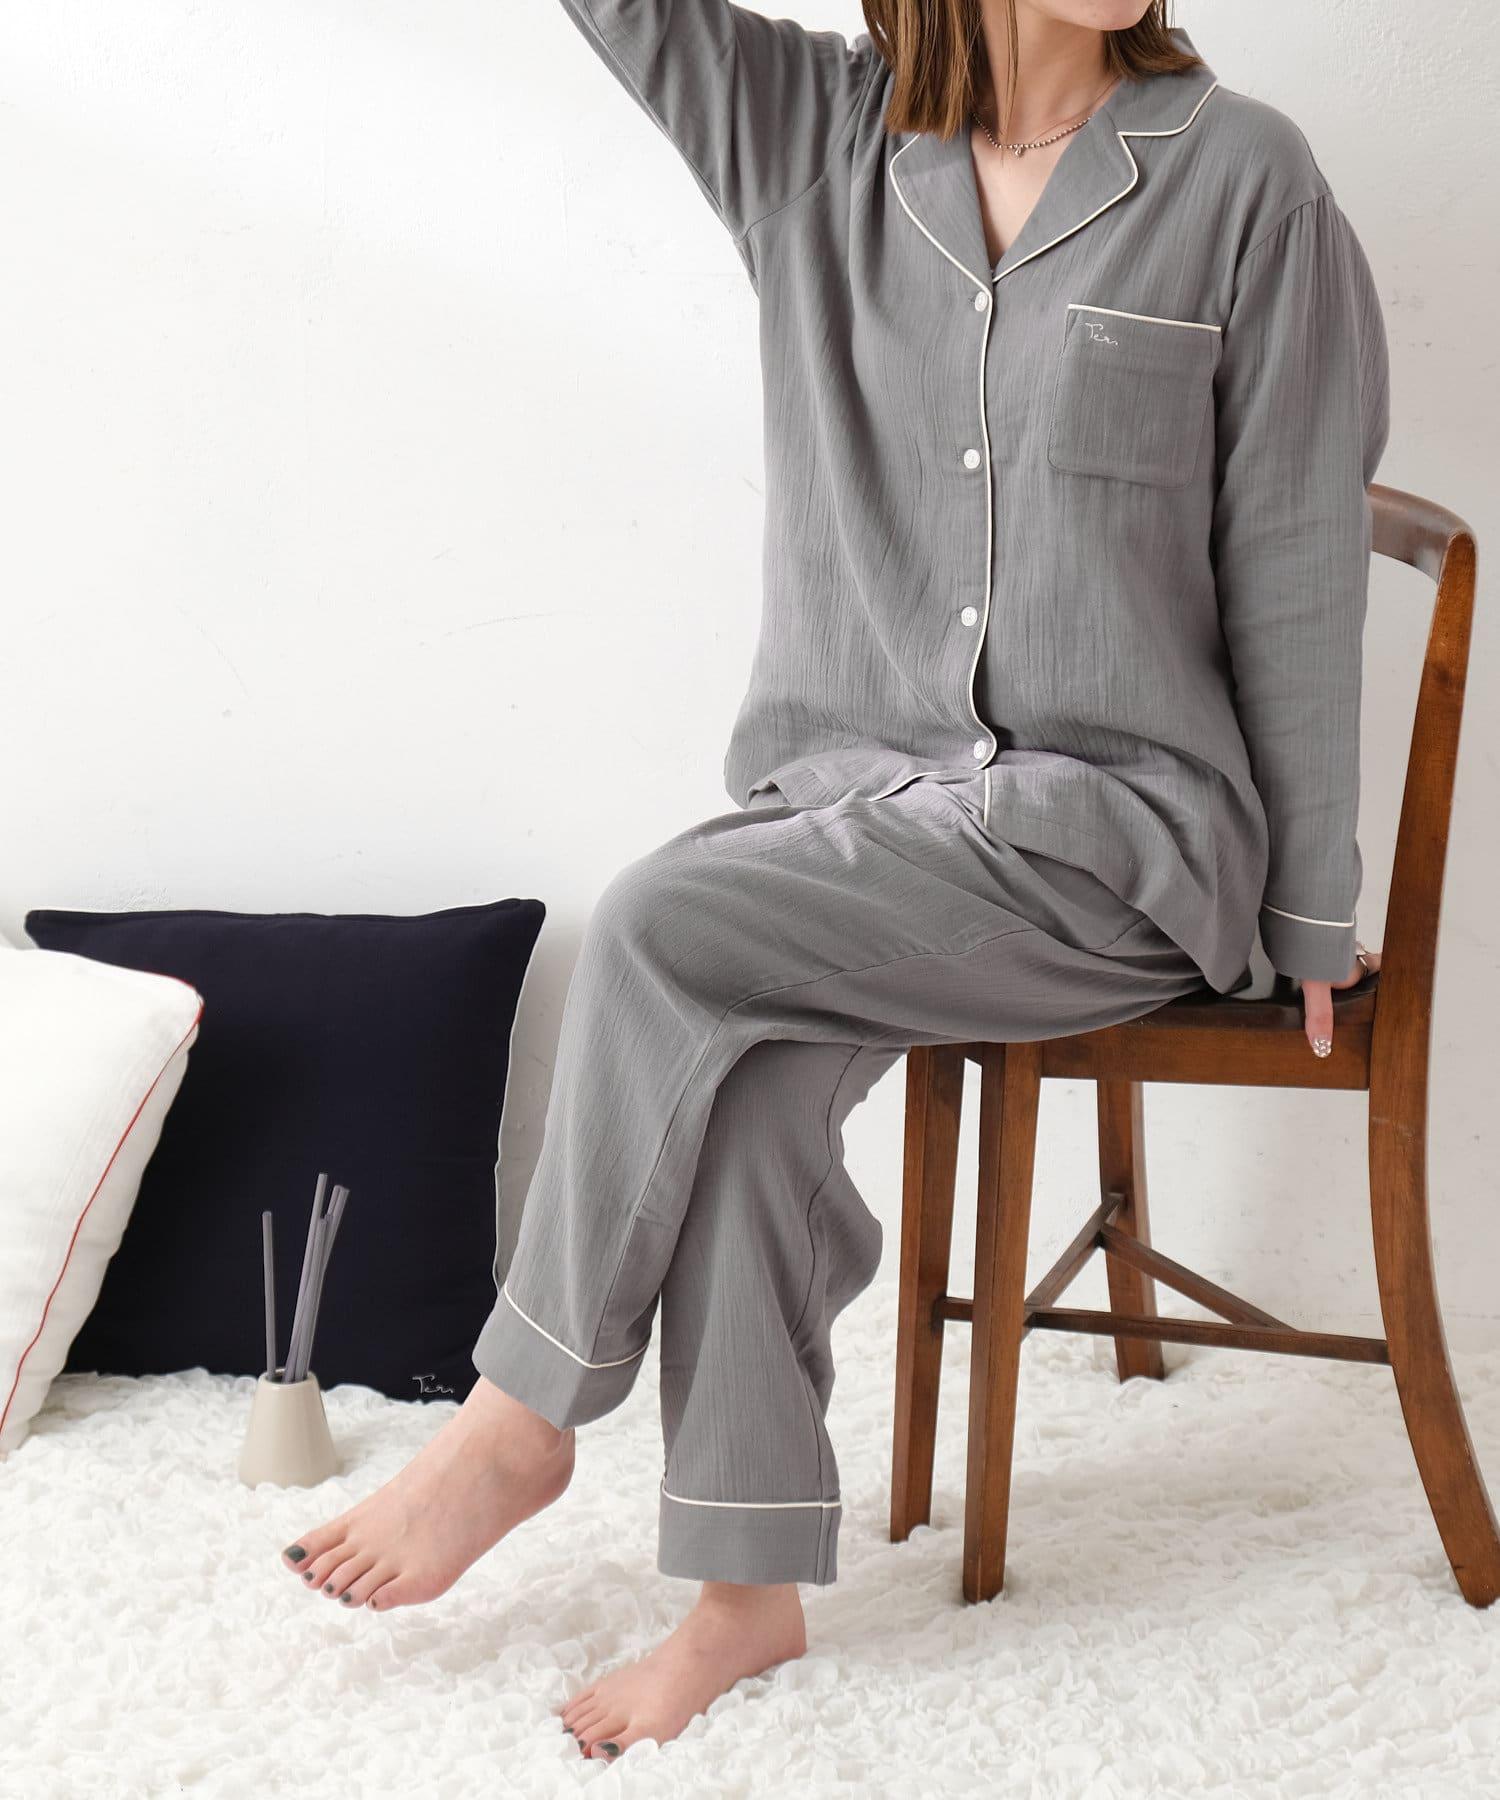 TERRITOIRE(テリトワール) 【オーガニックコットン】LADIESしあわせWガーゼパジャマ 上下セット